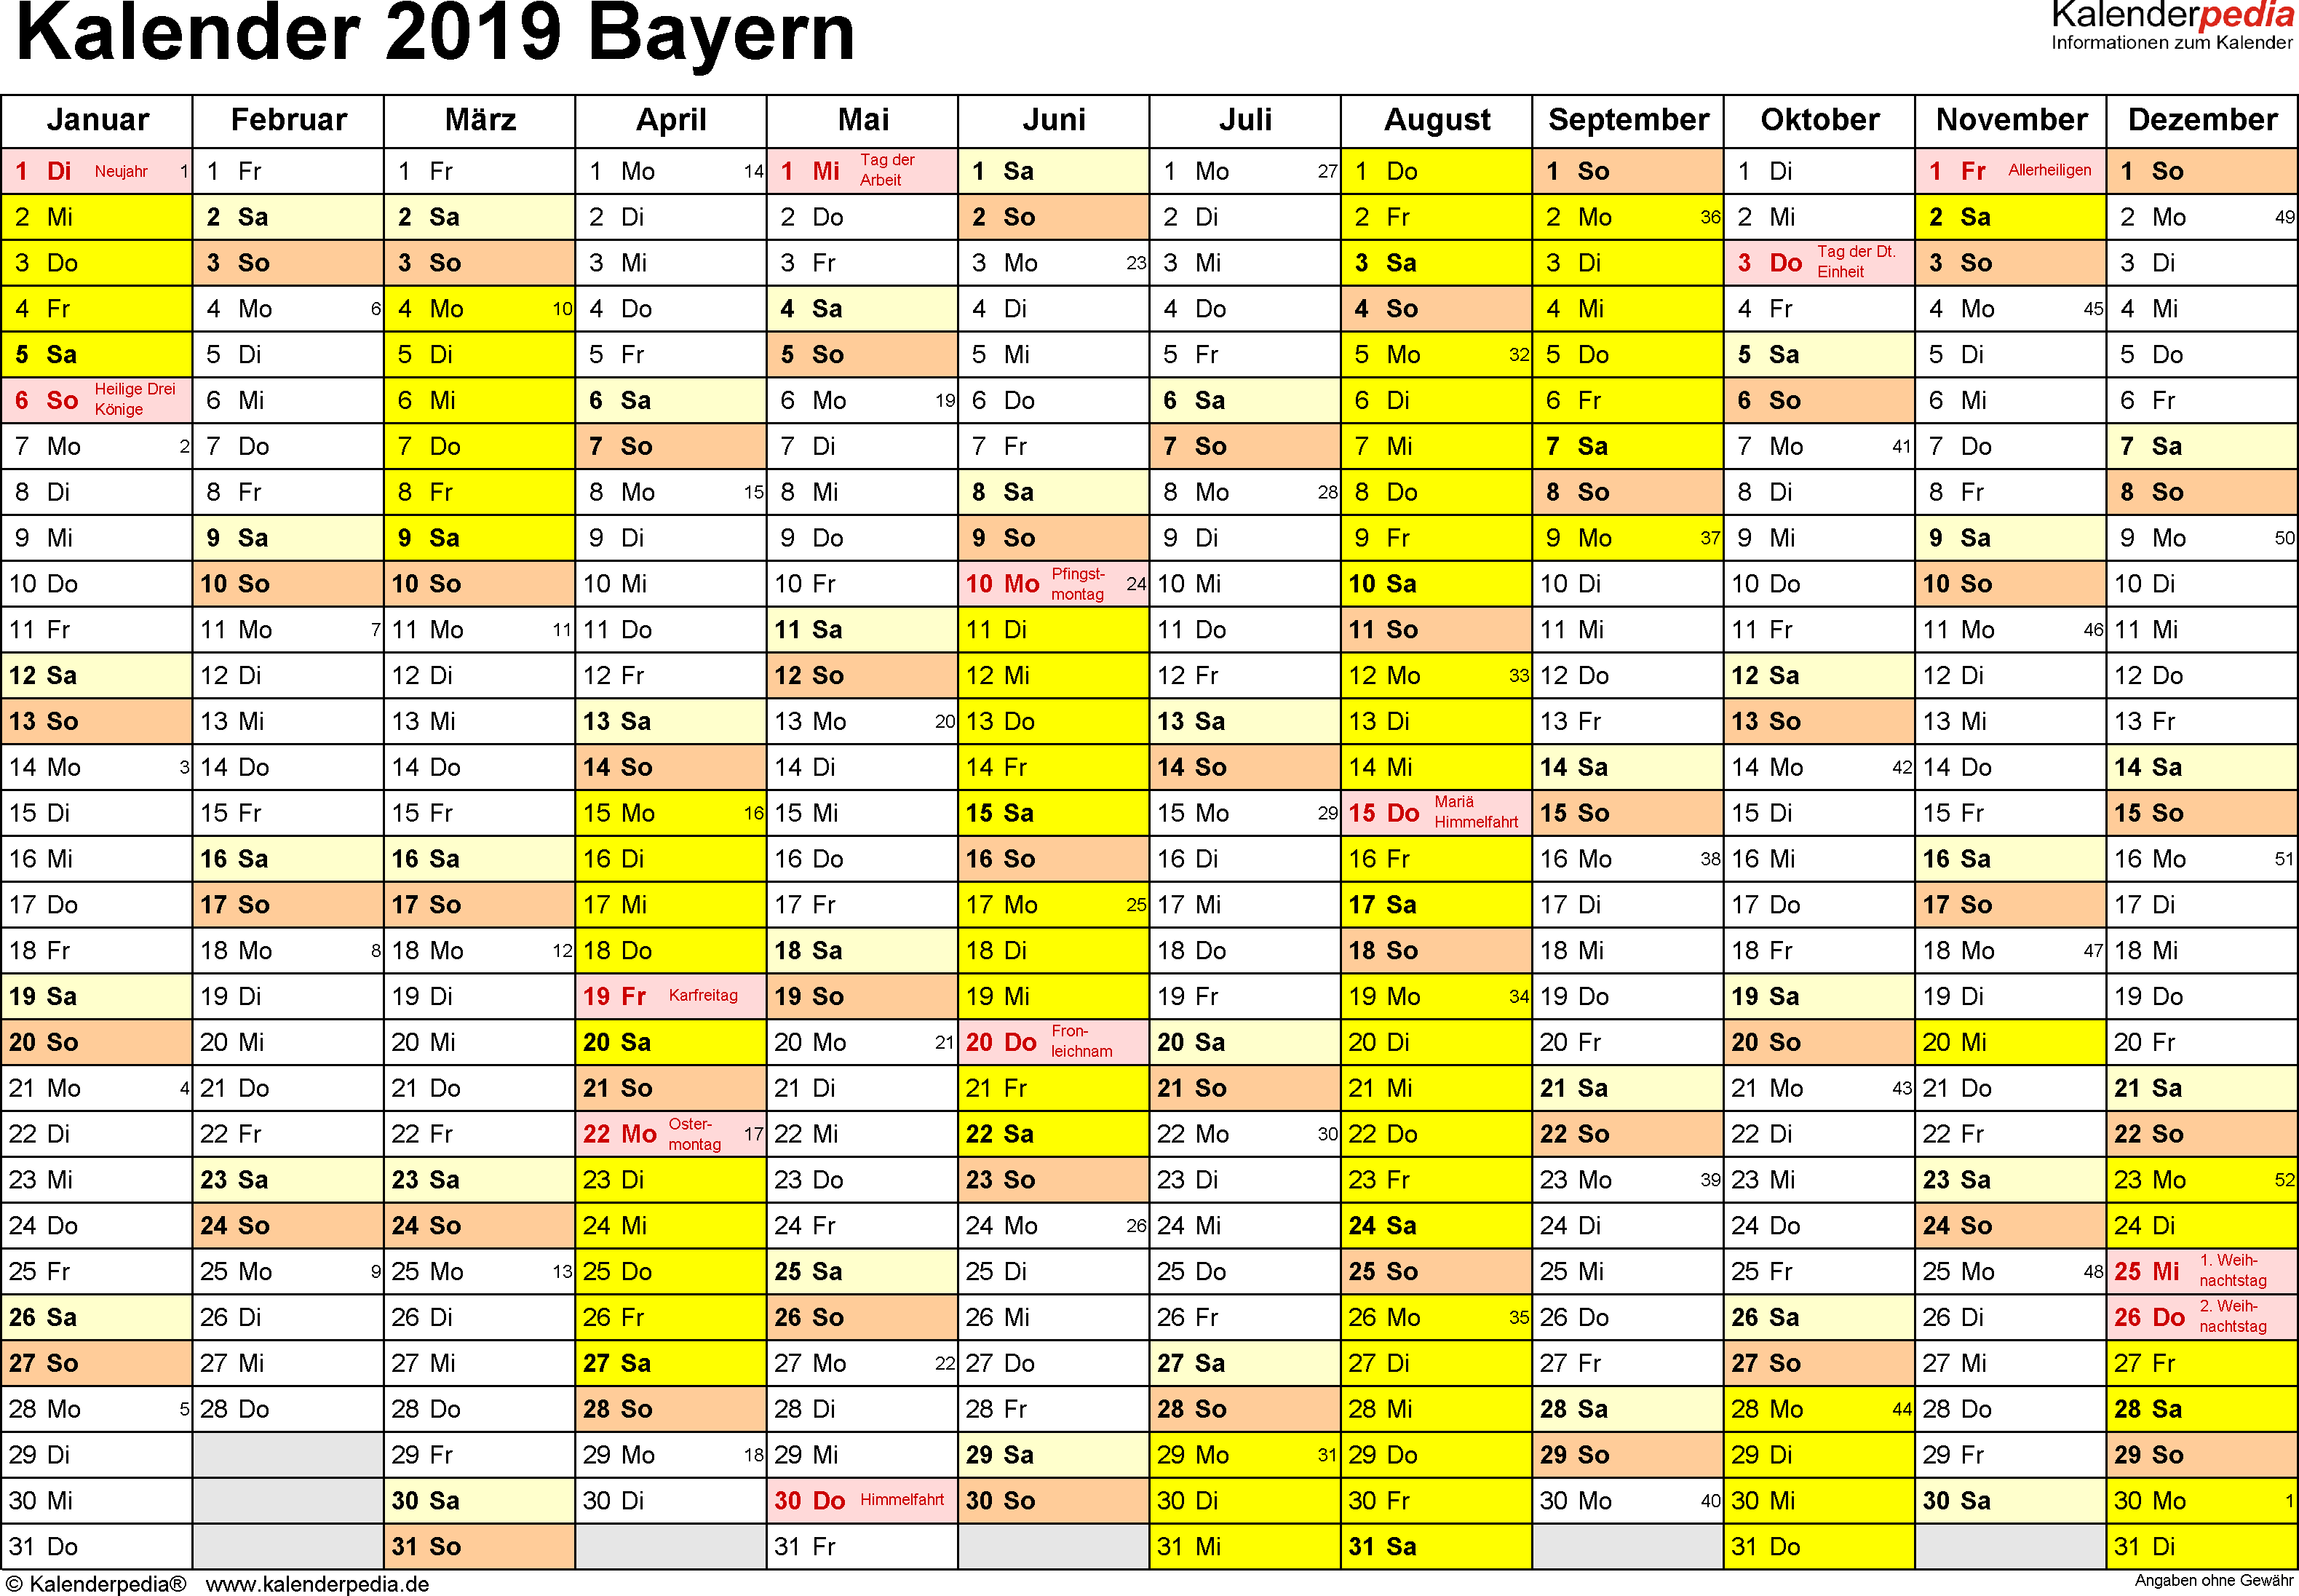 gfl tabelle 2019